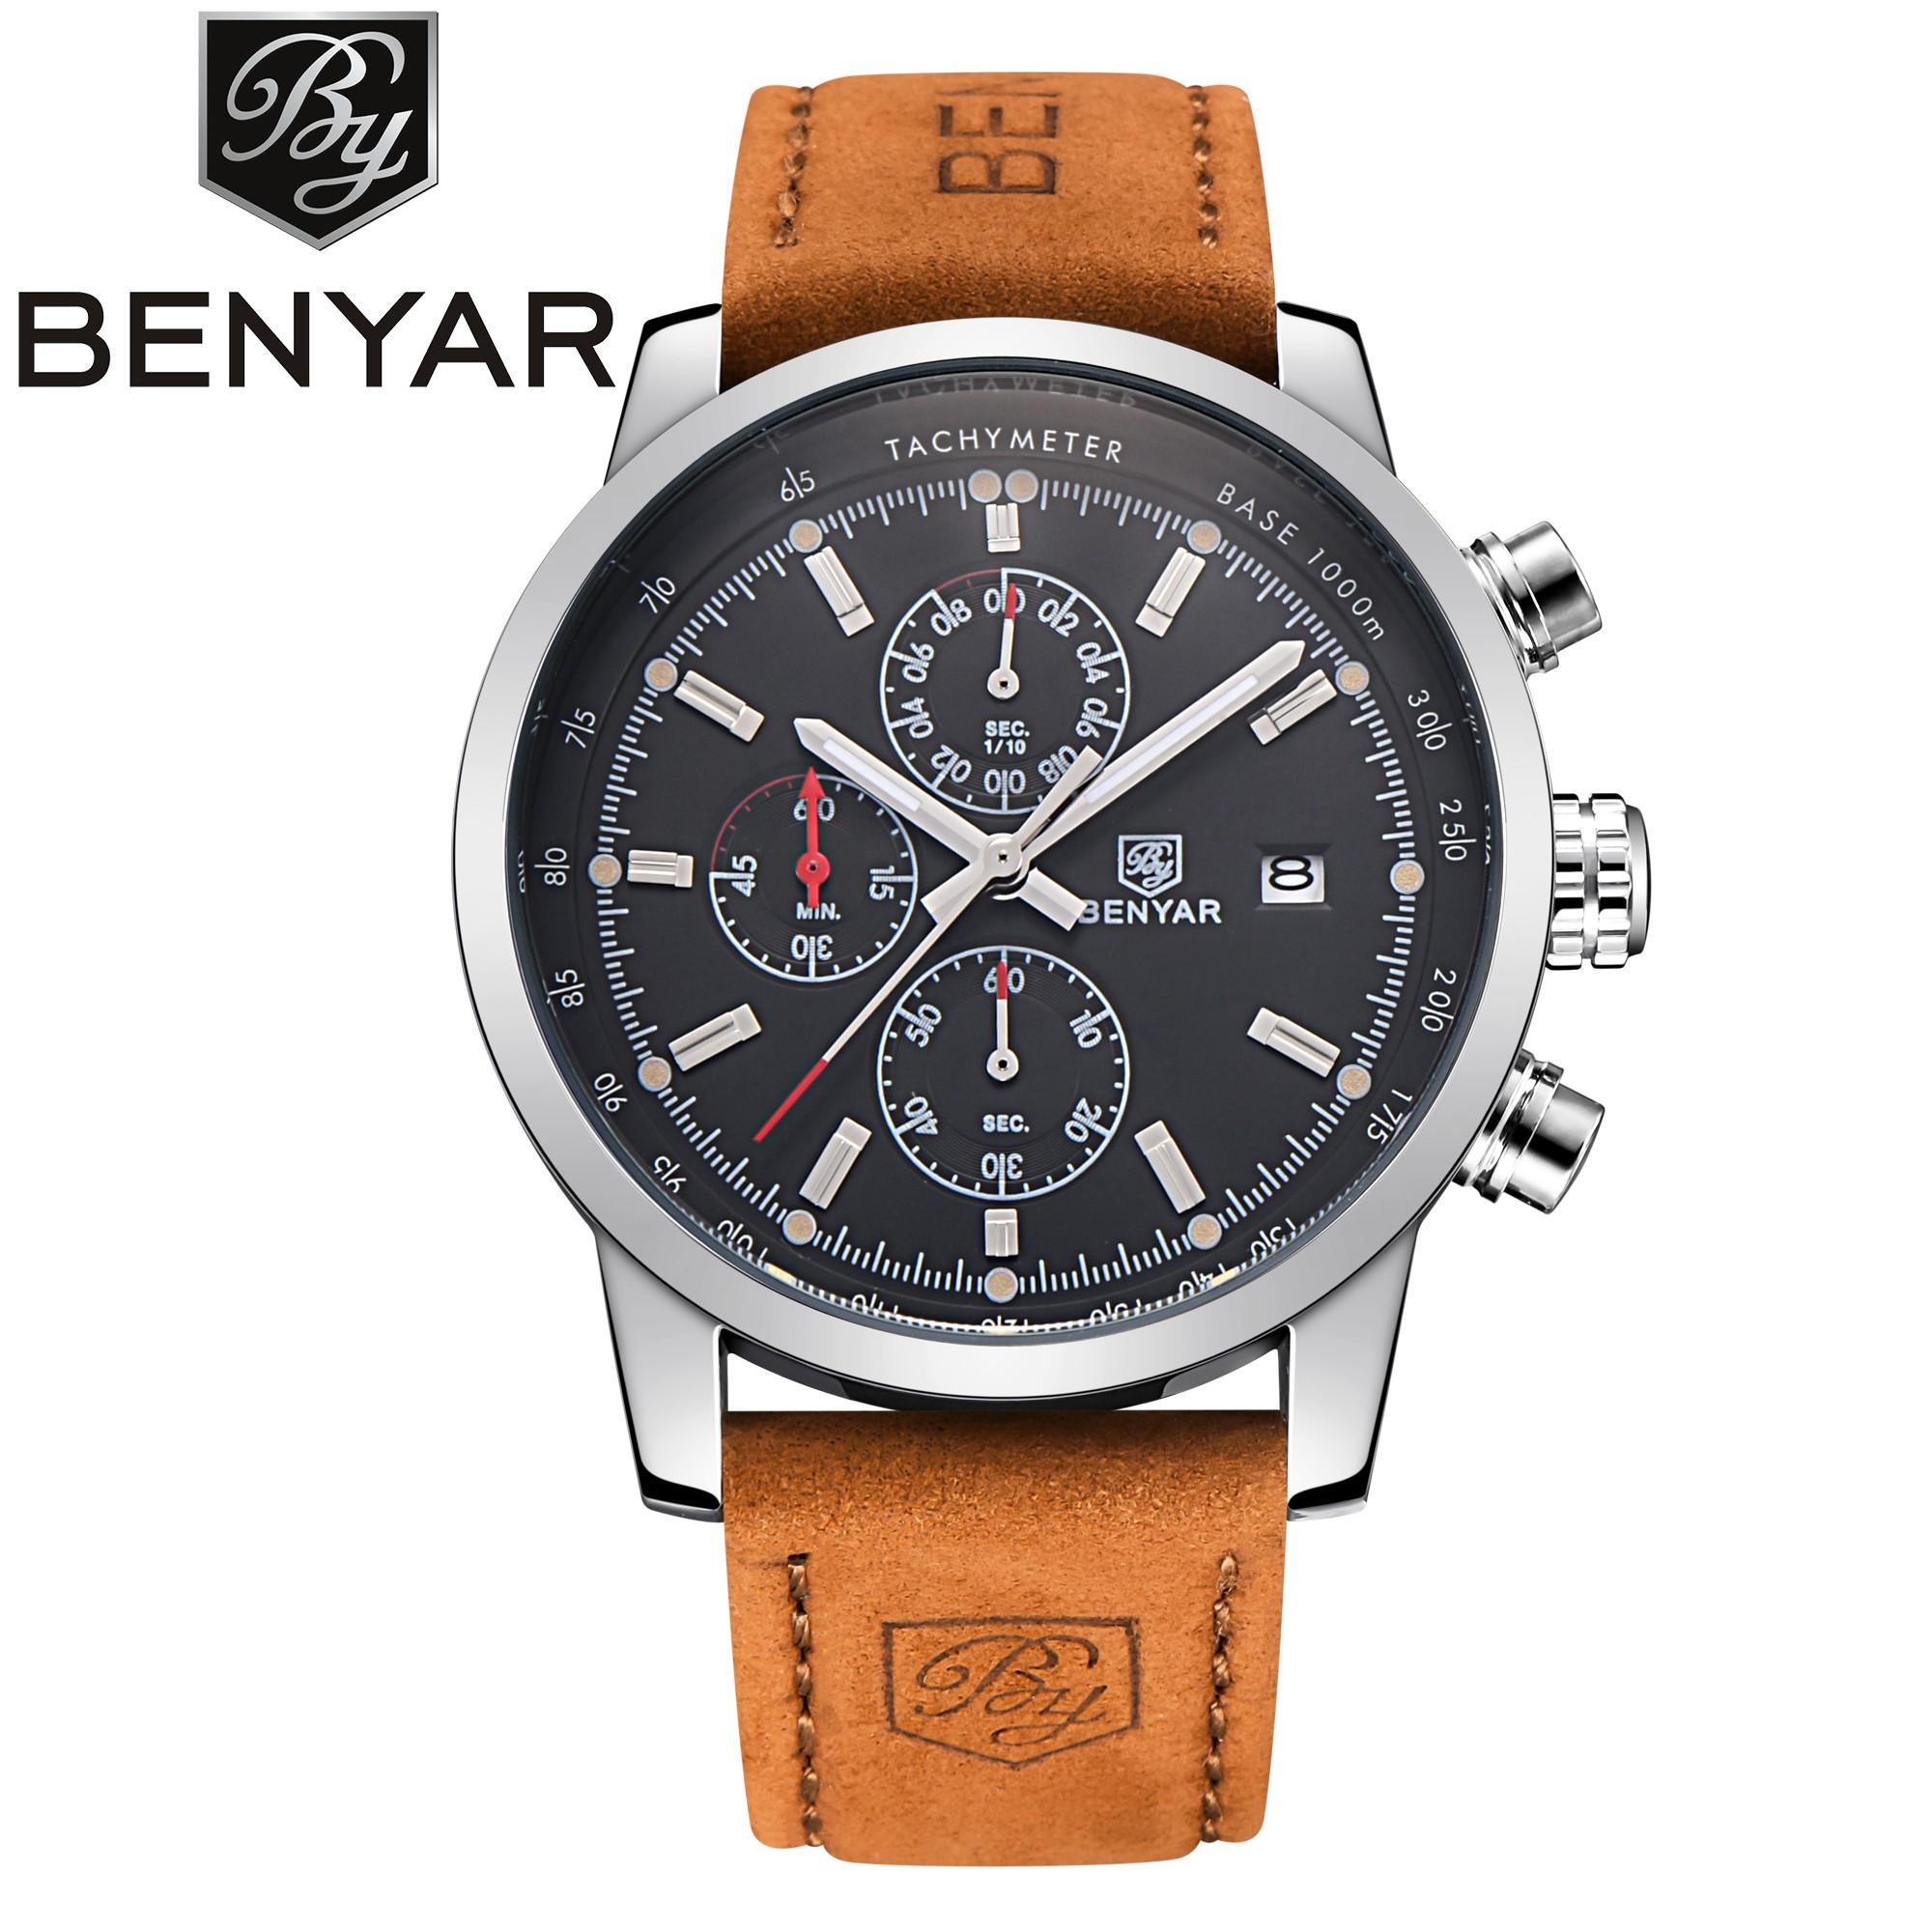 BENYAR 5102 Brand Watch Chronograph Sport Men Quartz Date Watches фото